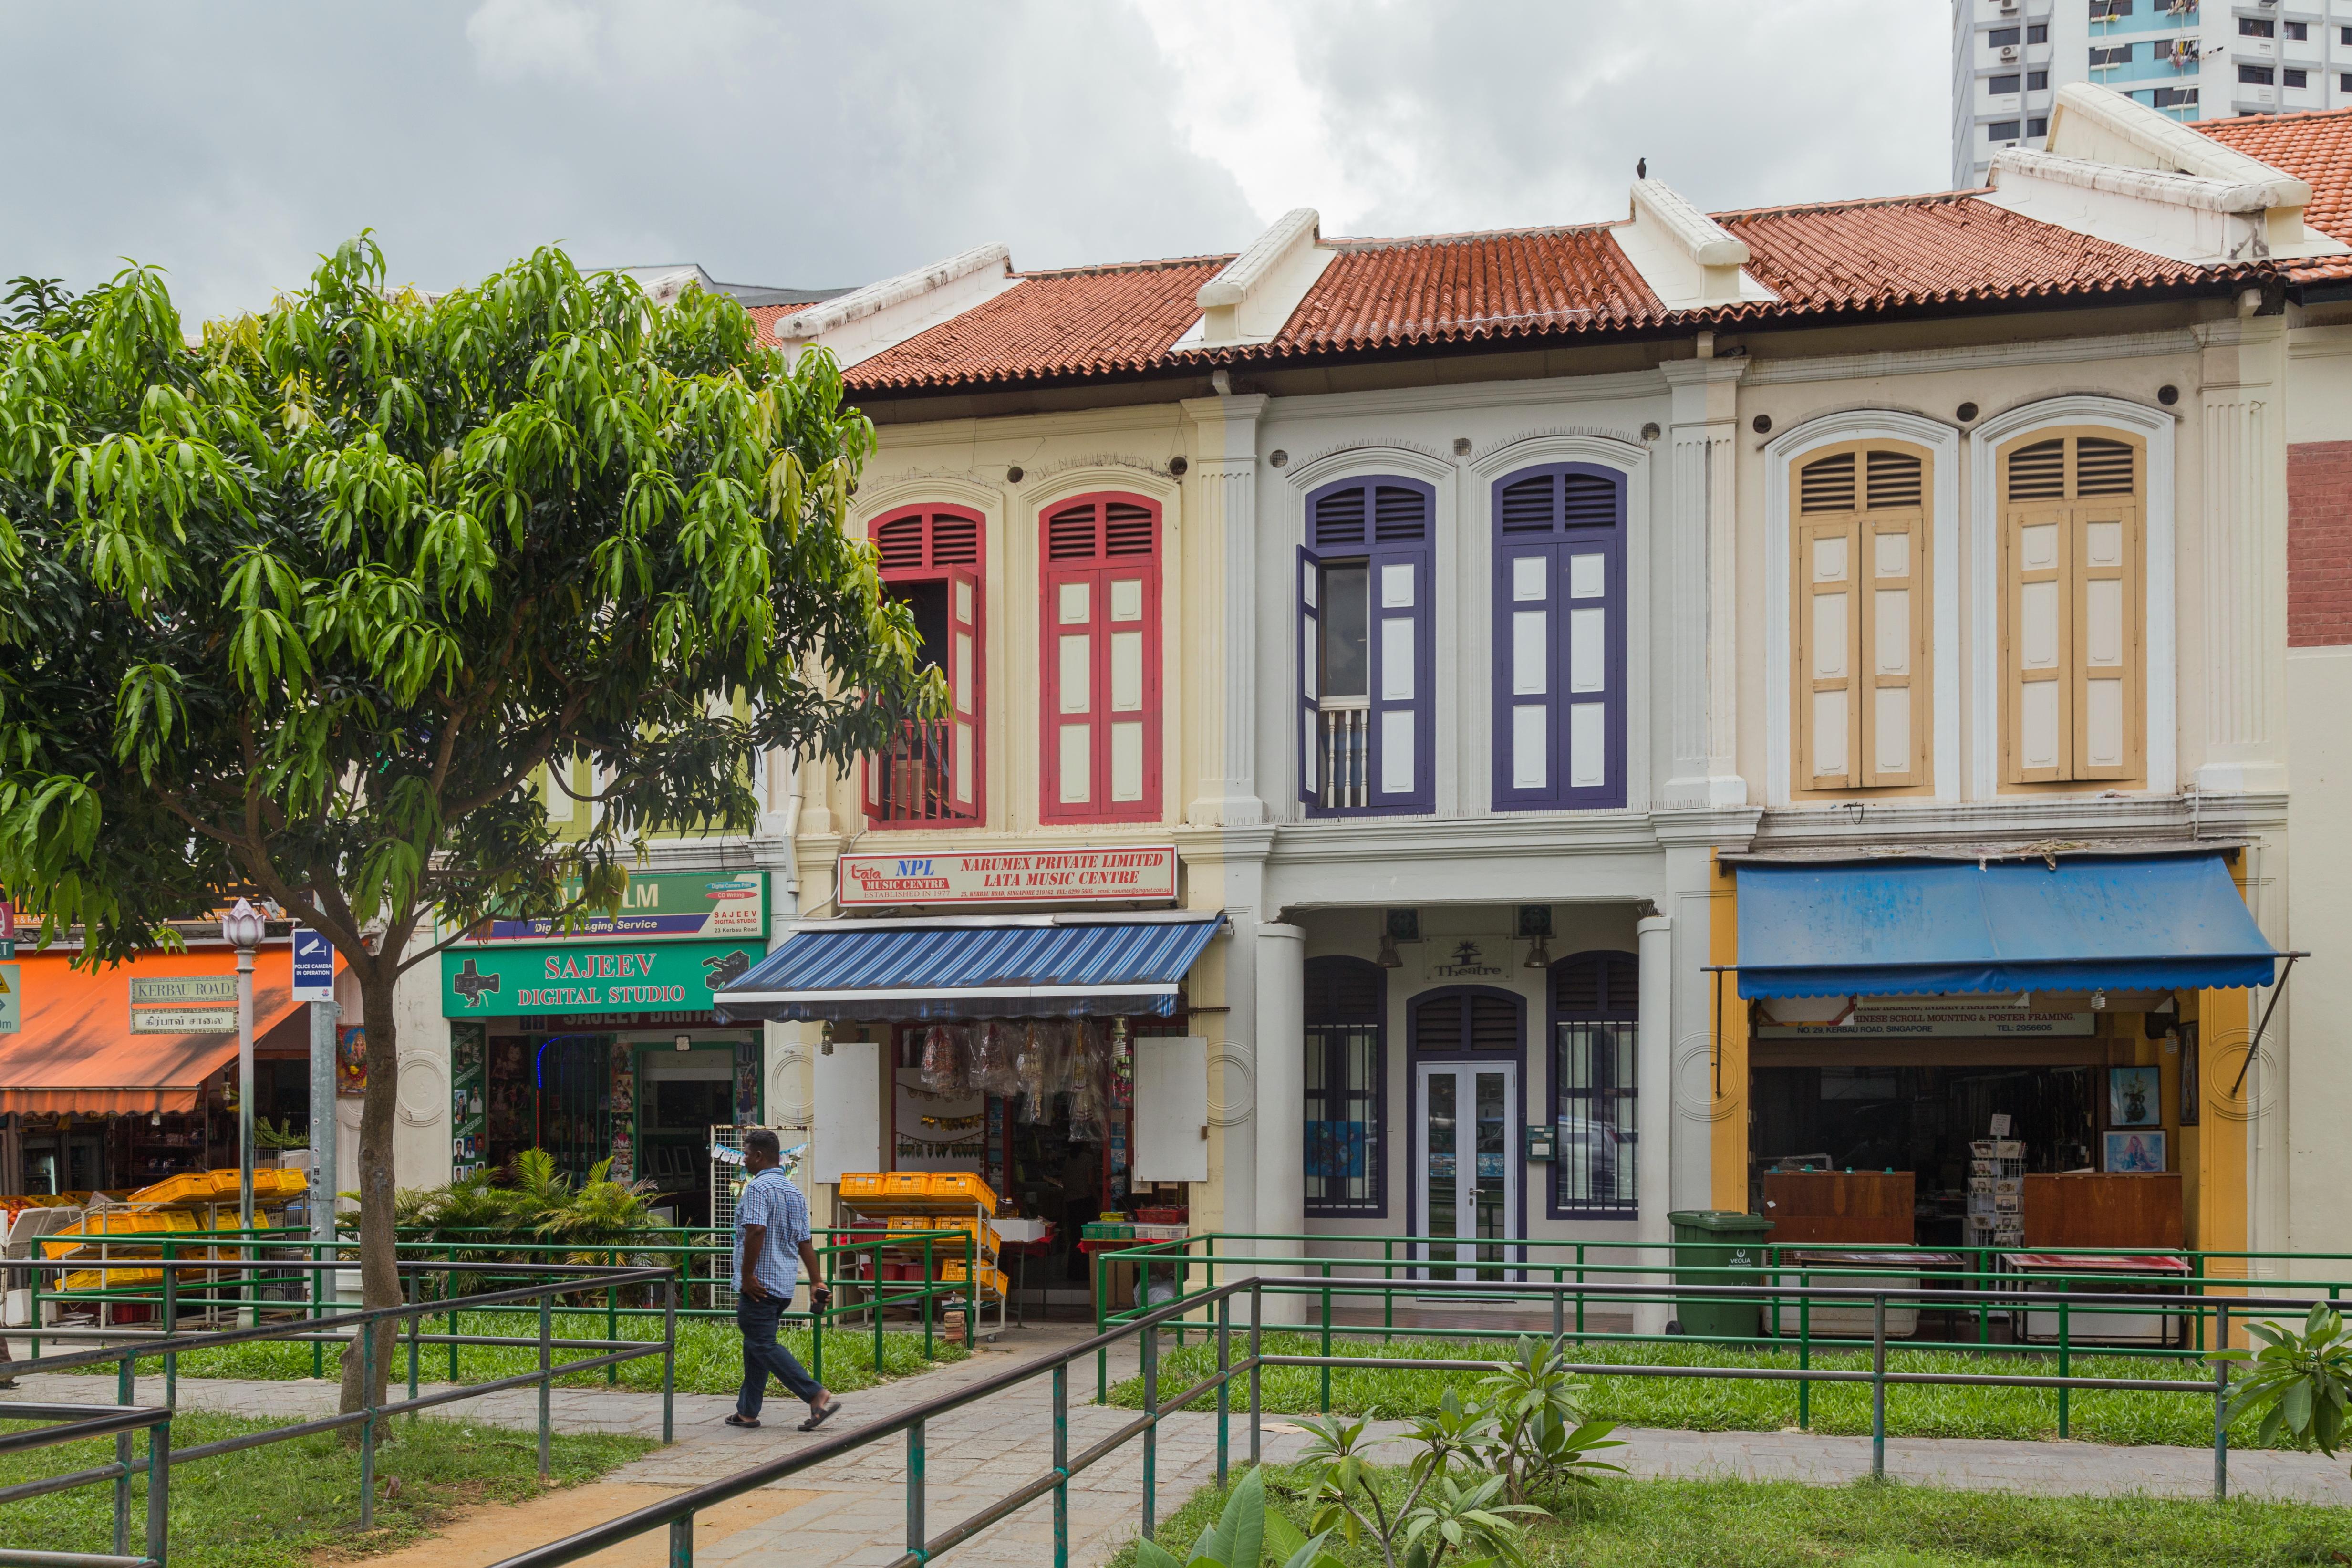 File:2016 Singapur, Little India, Ulica Kerbau, Domy-sklepy